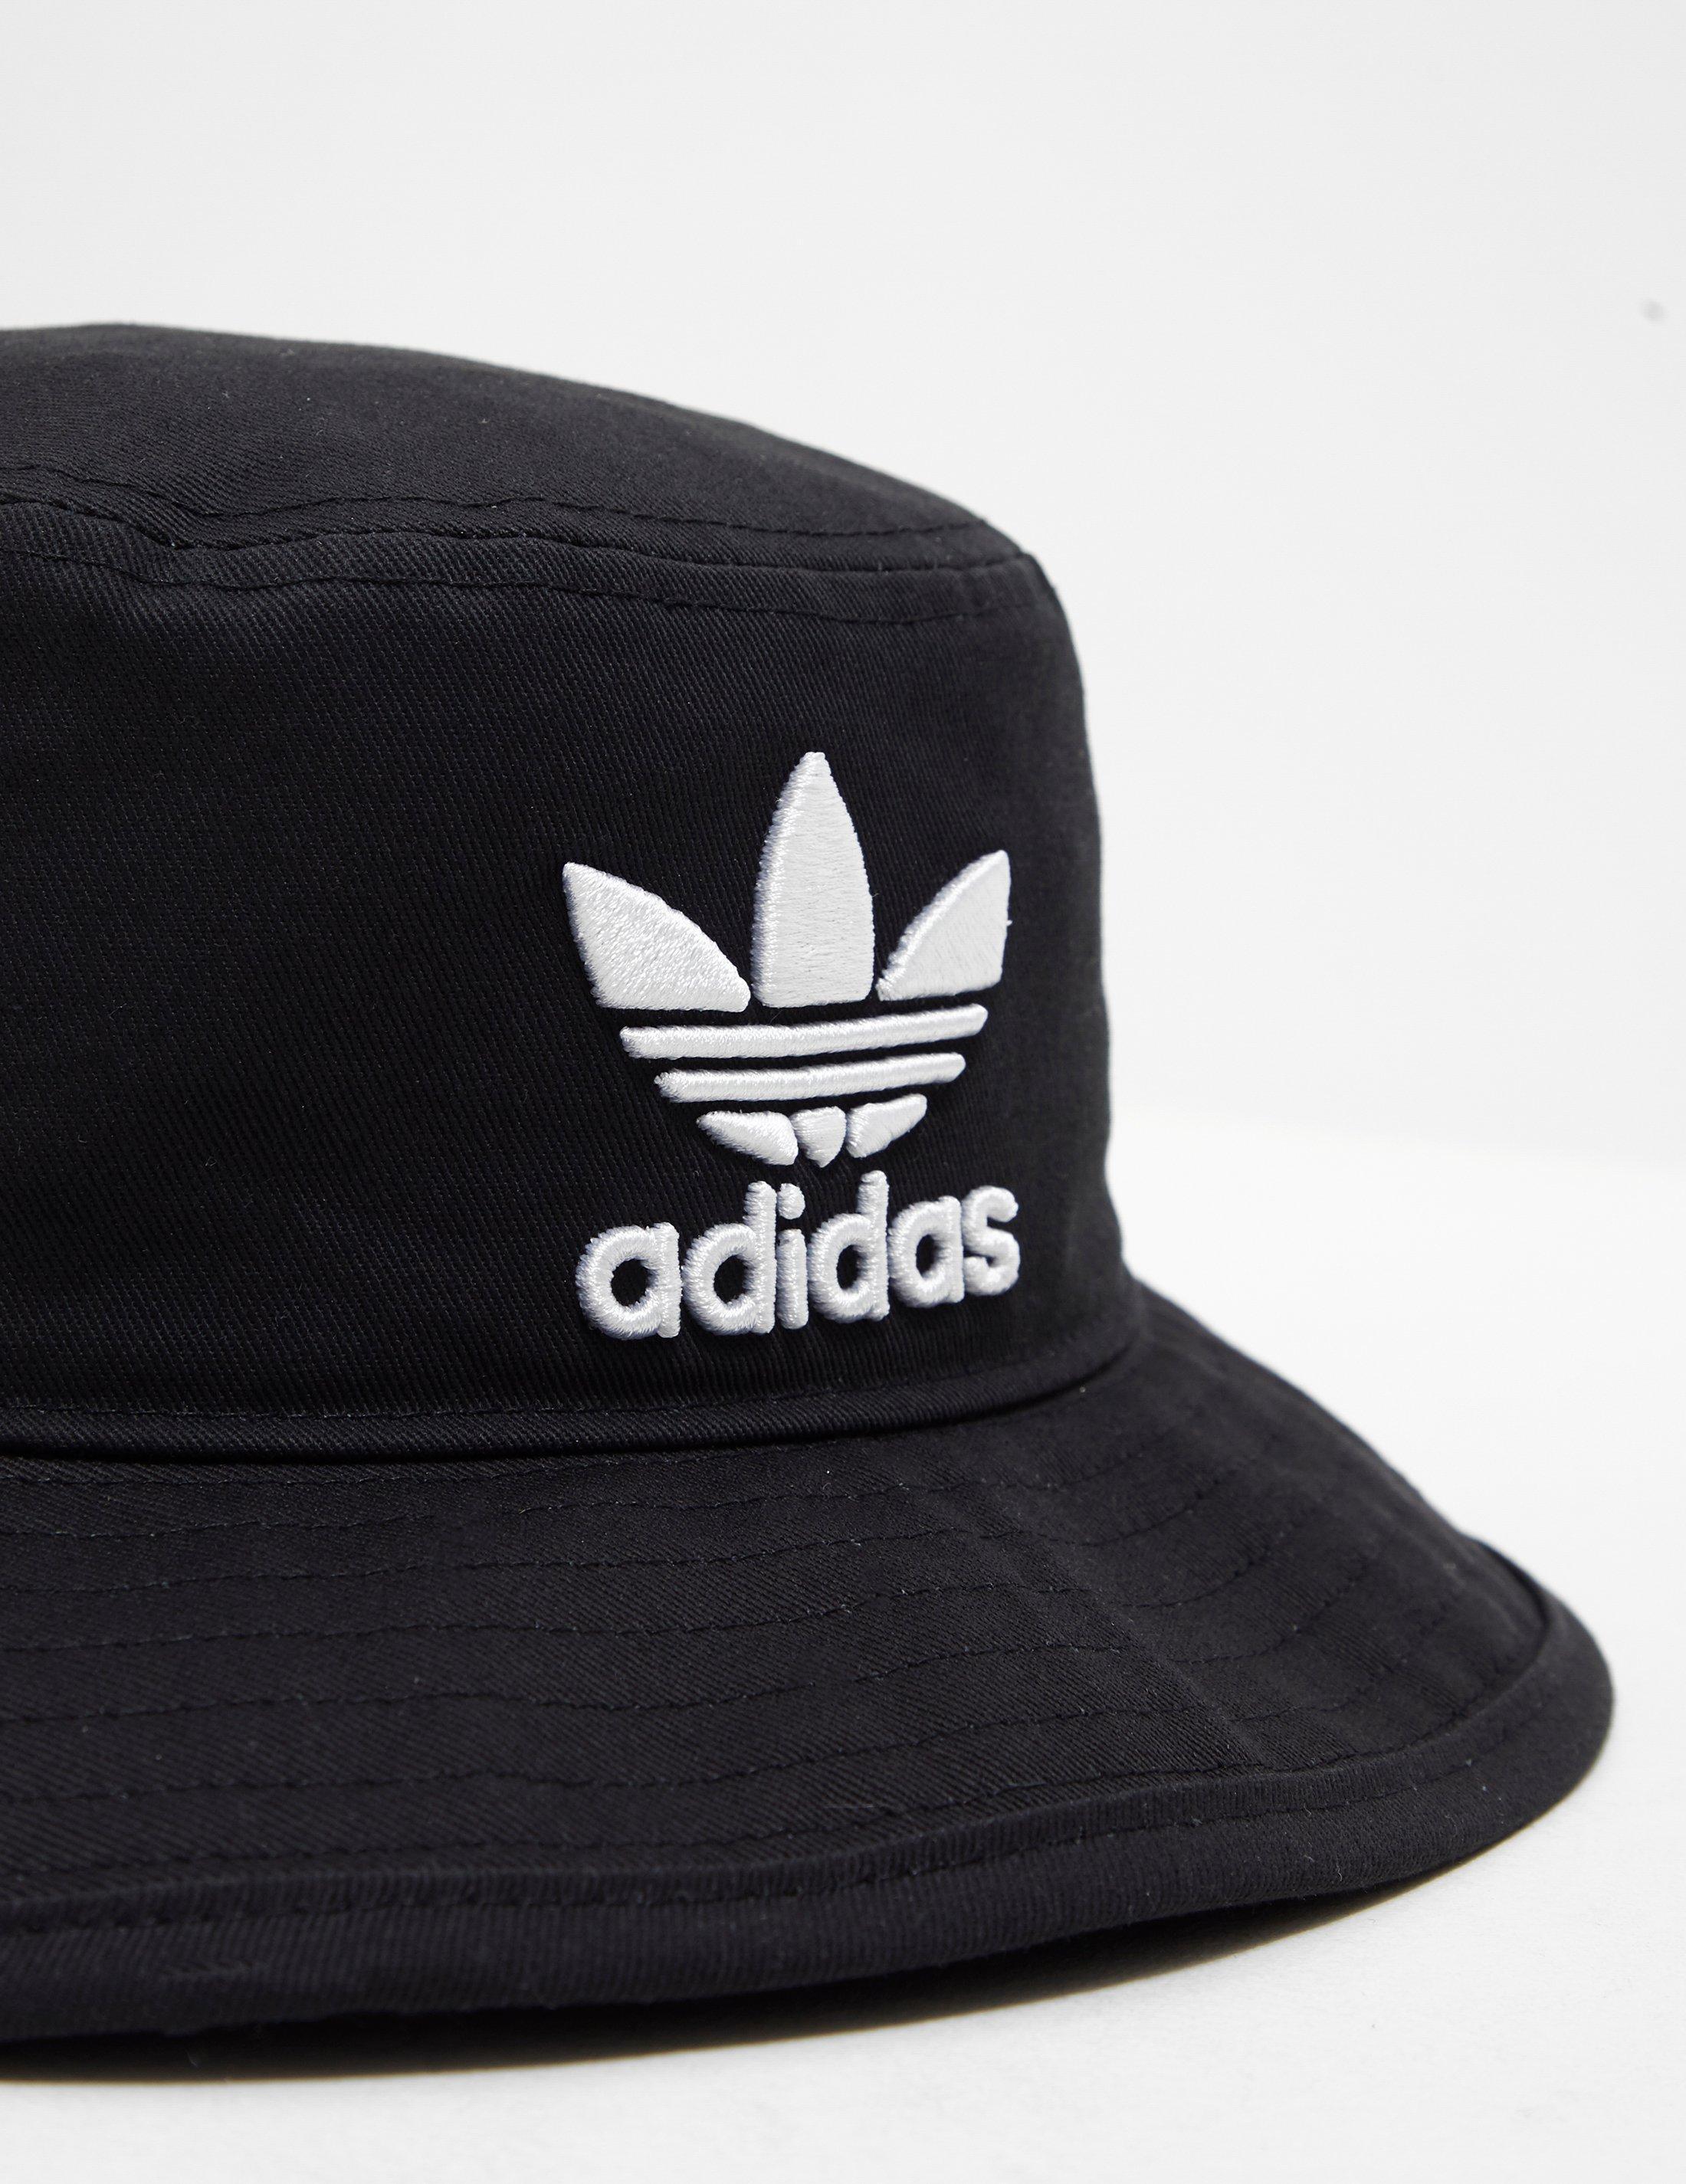 Lyst - adidas Originals Mens Trefoil Bucket Hat Black black in Black ... 09815ac1bcee